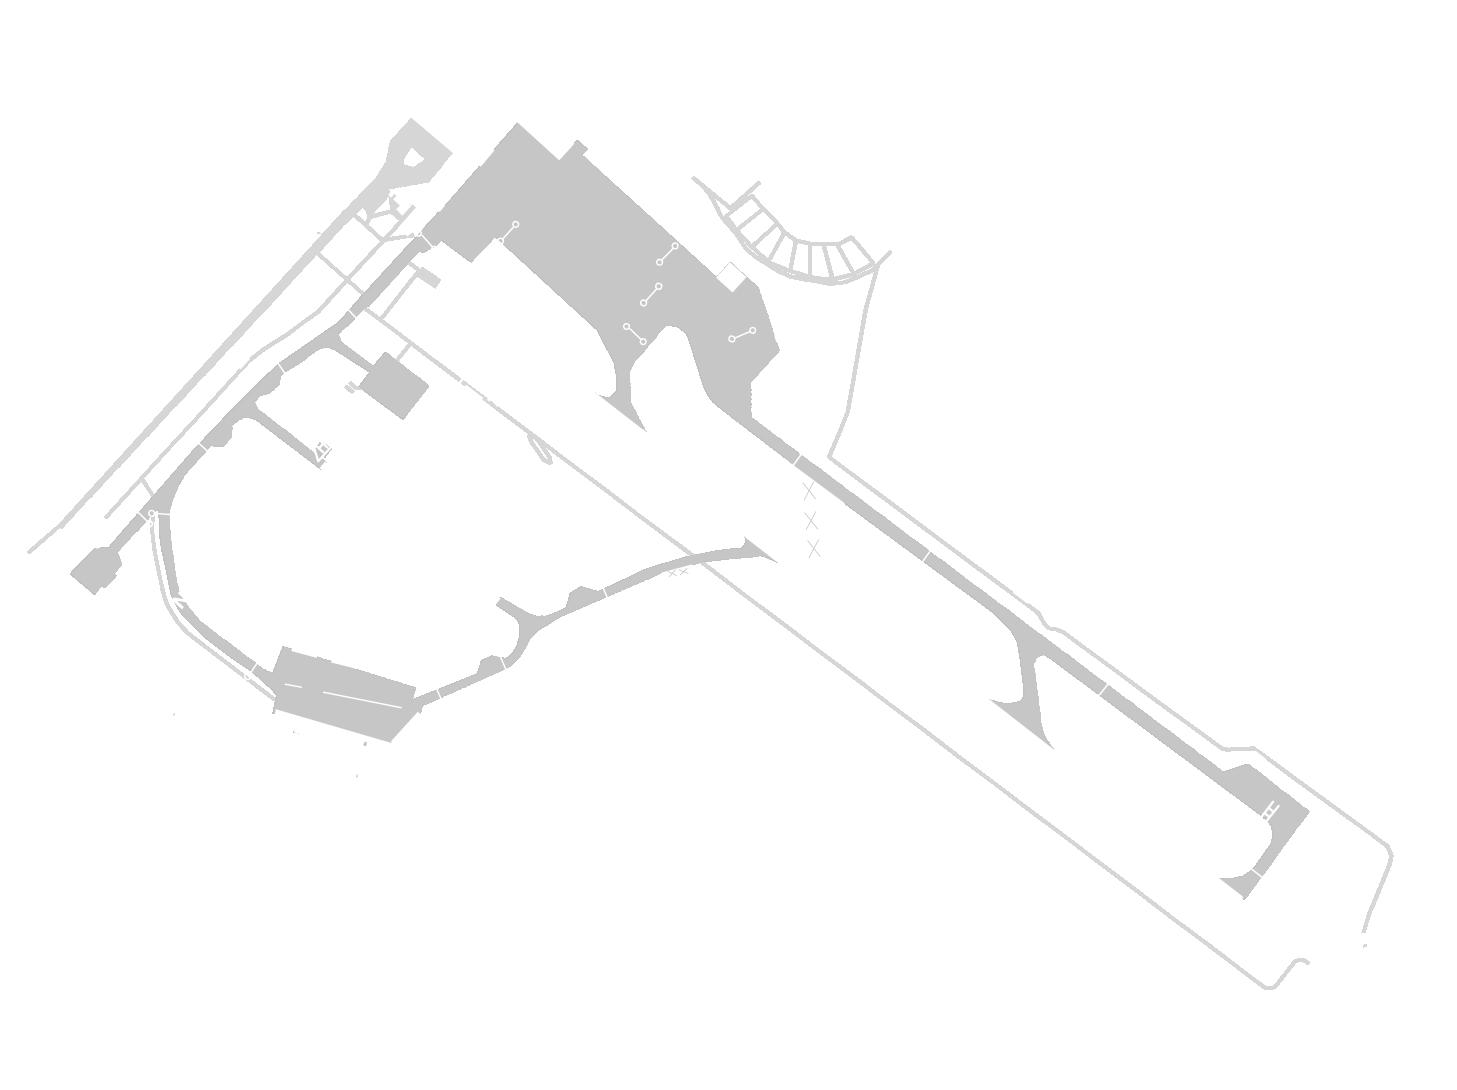 mappa milanolin